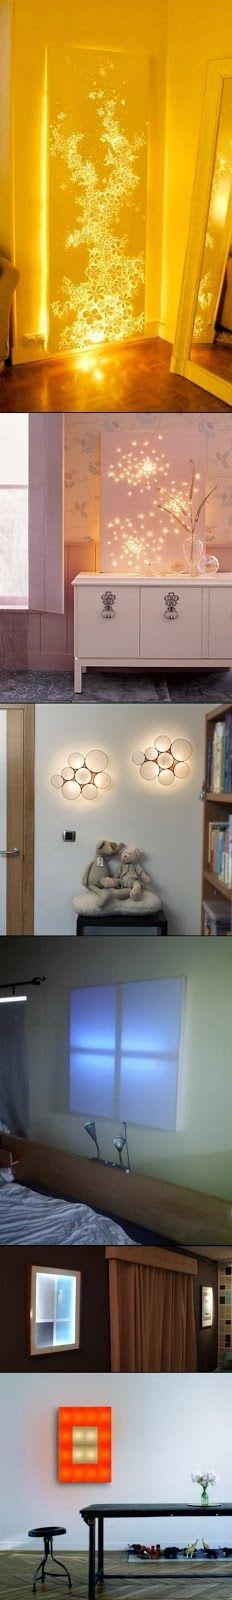 DIY DIY DIY DIY DIY: How To: Make a Glittering Lightscape